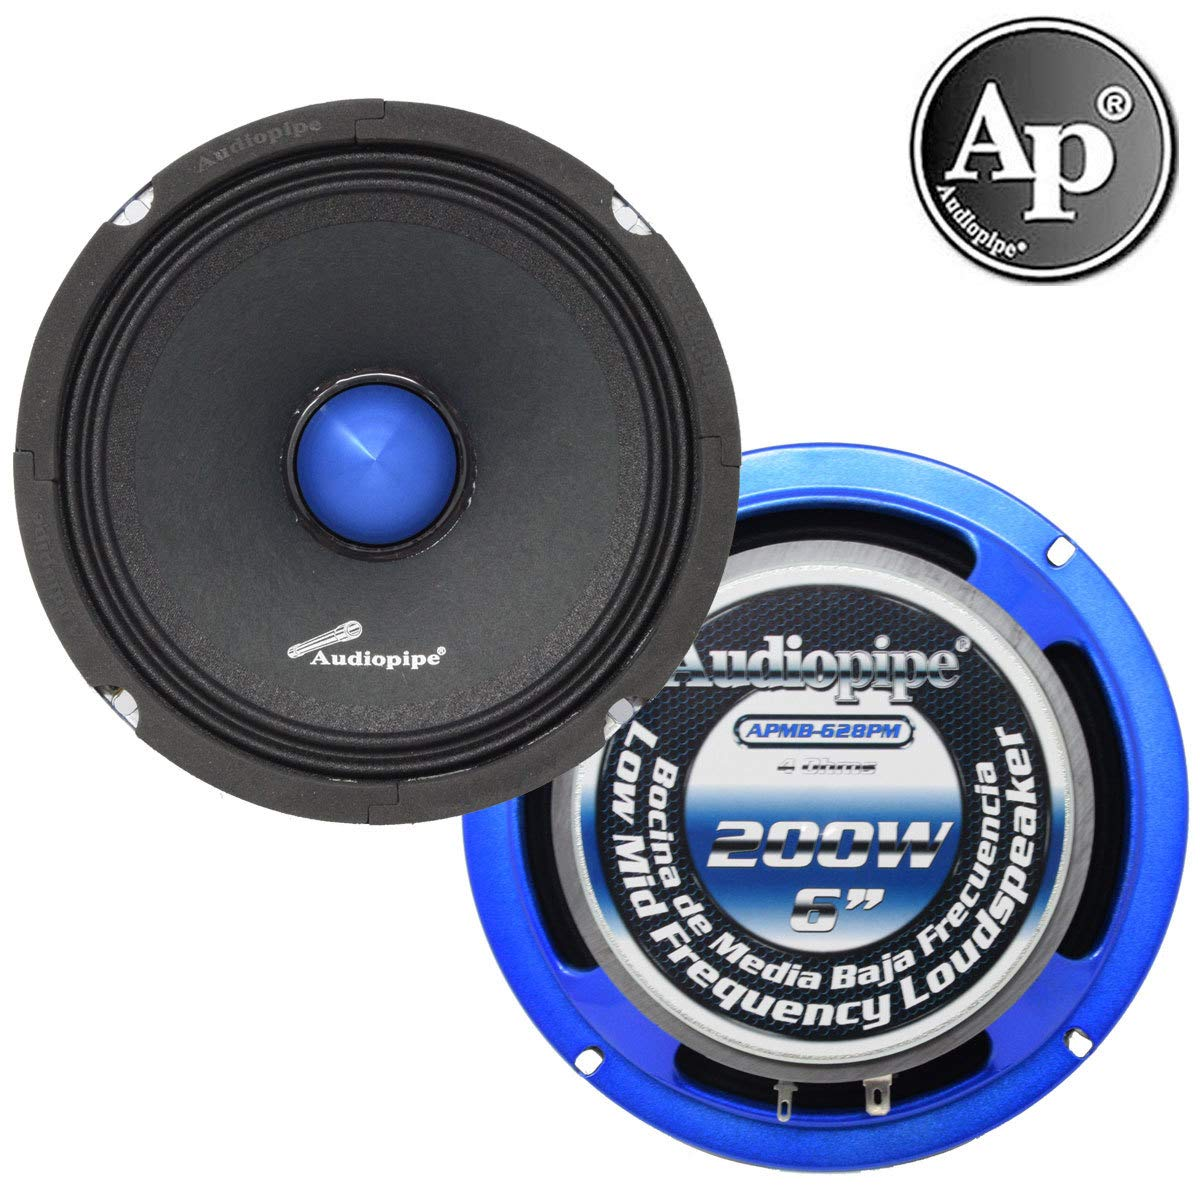 Audiopipe (1) 6インチミッドフルレンジ 200ワット 大音量スピーカー 4オーム スリムマウント APMB-628PM B07KKPVND6